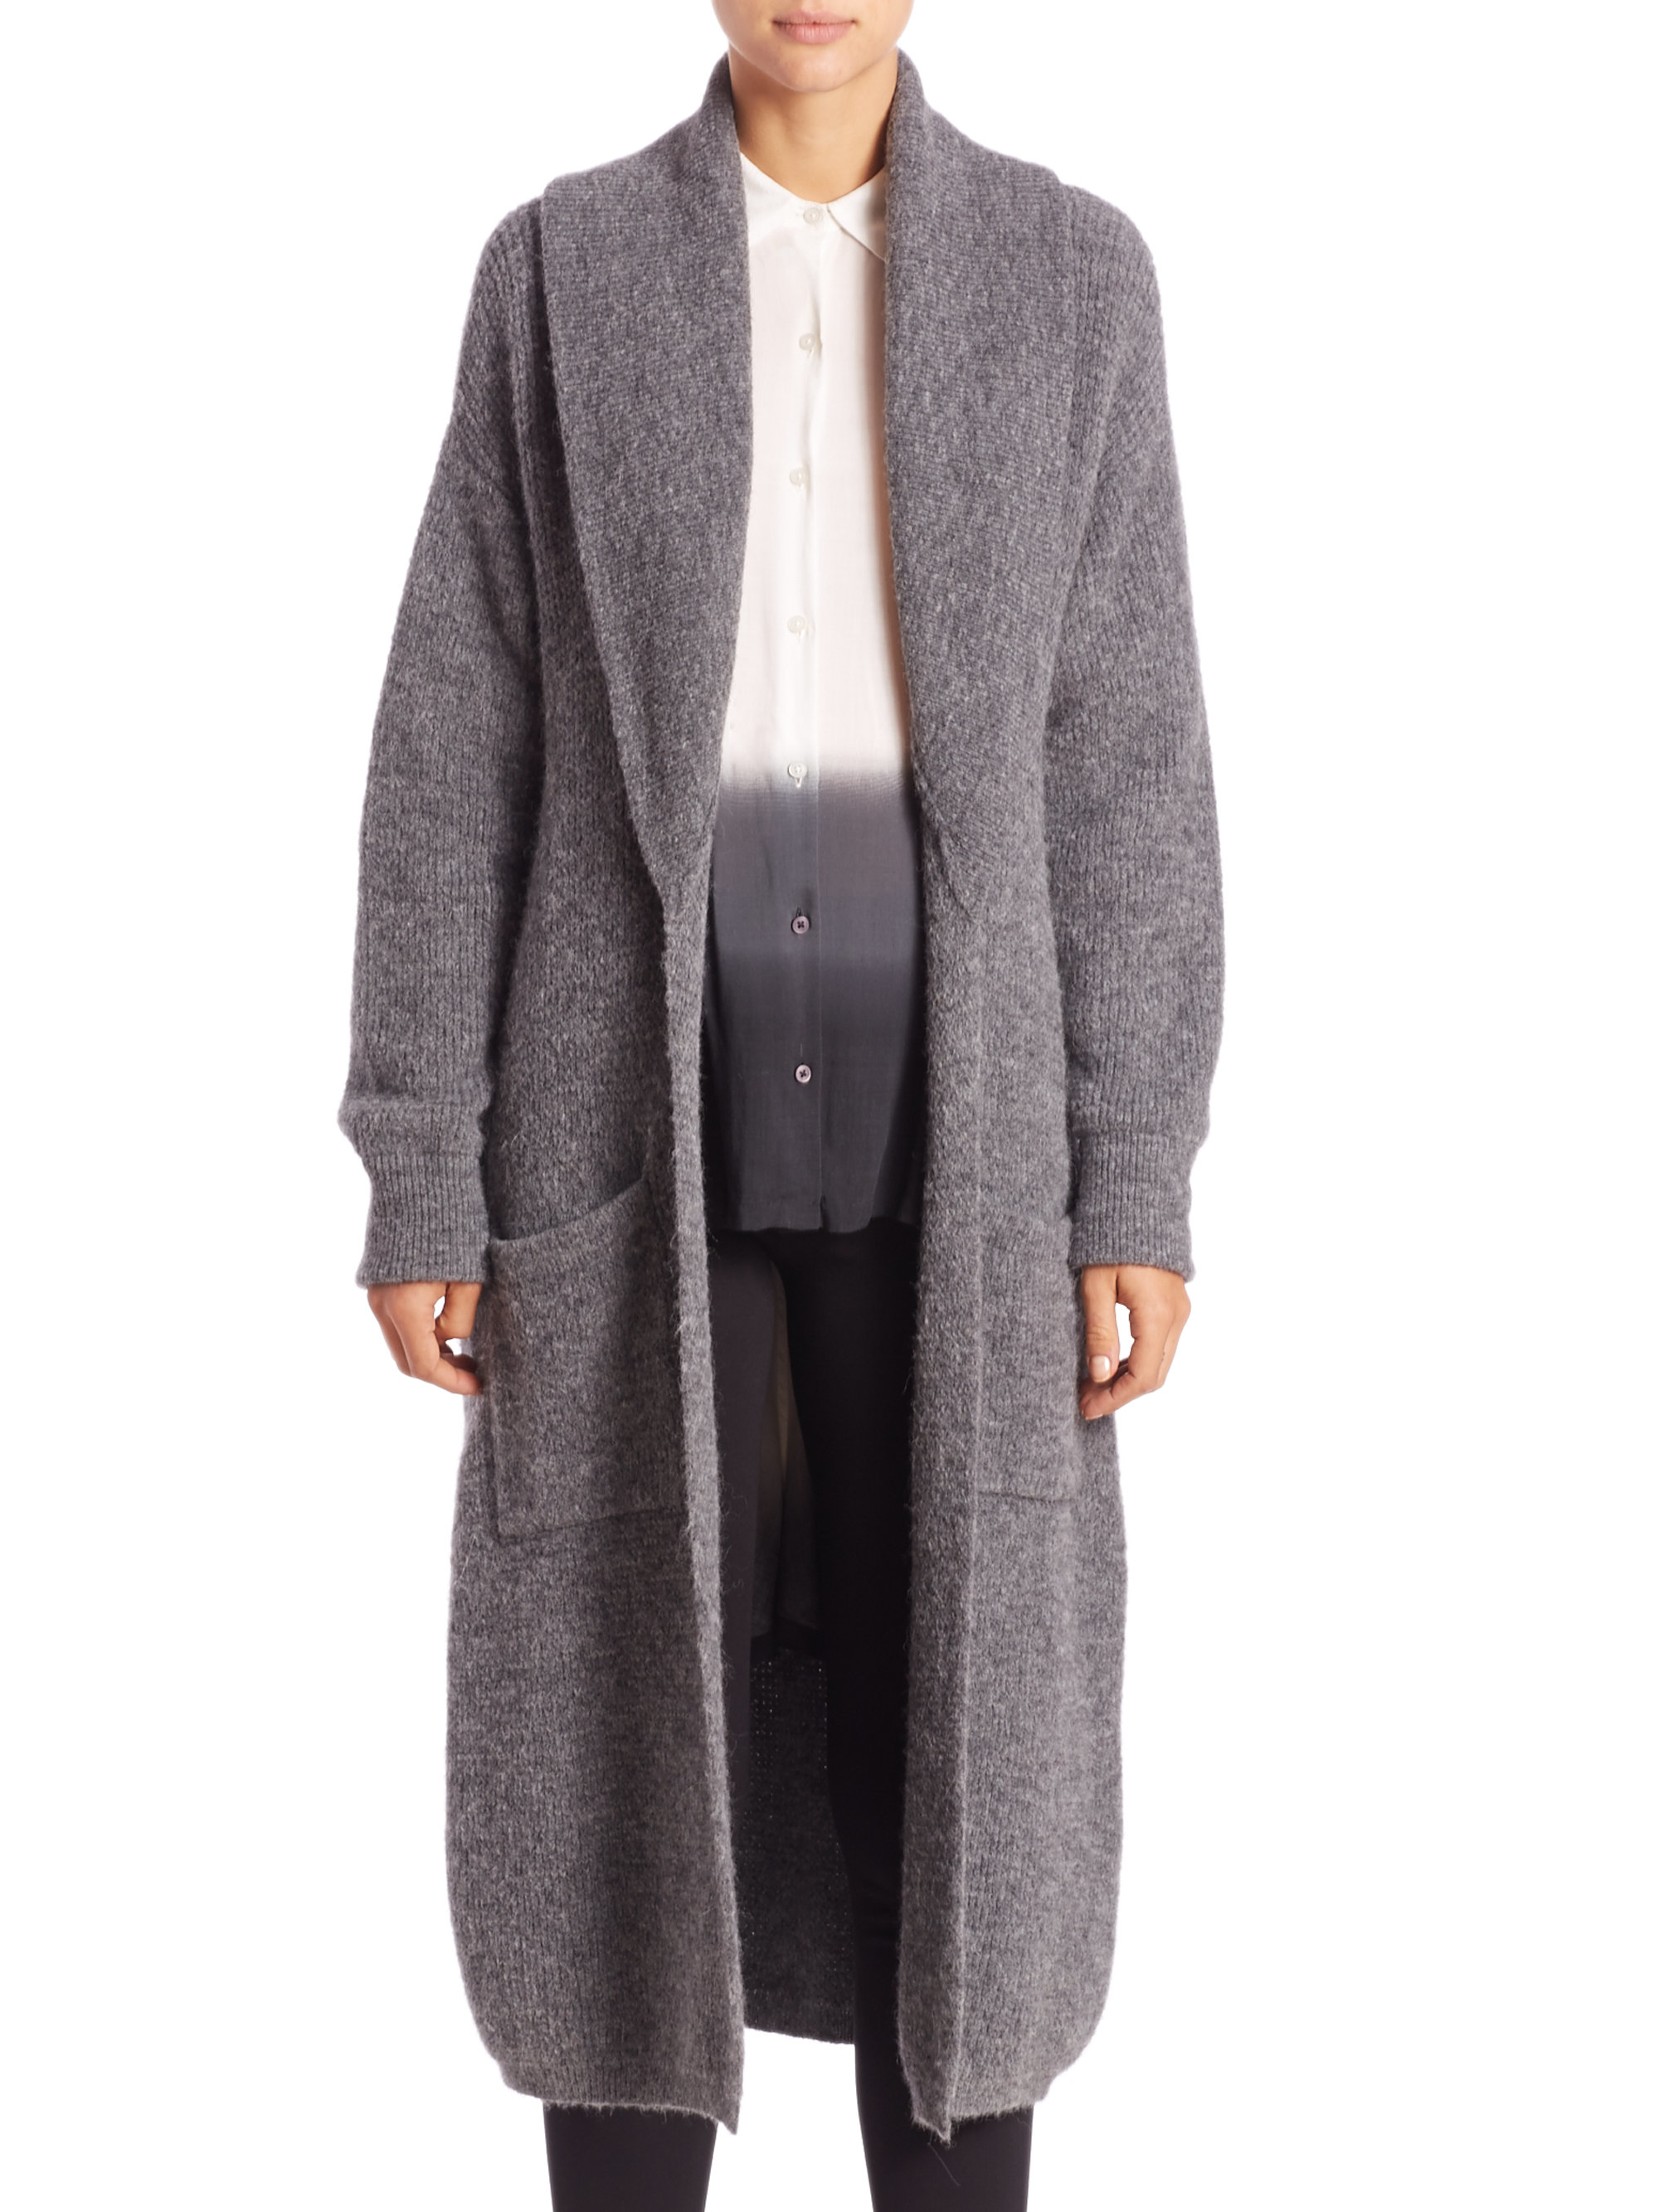 Dkny Long Open-front Cardigan in Gray | Lyst